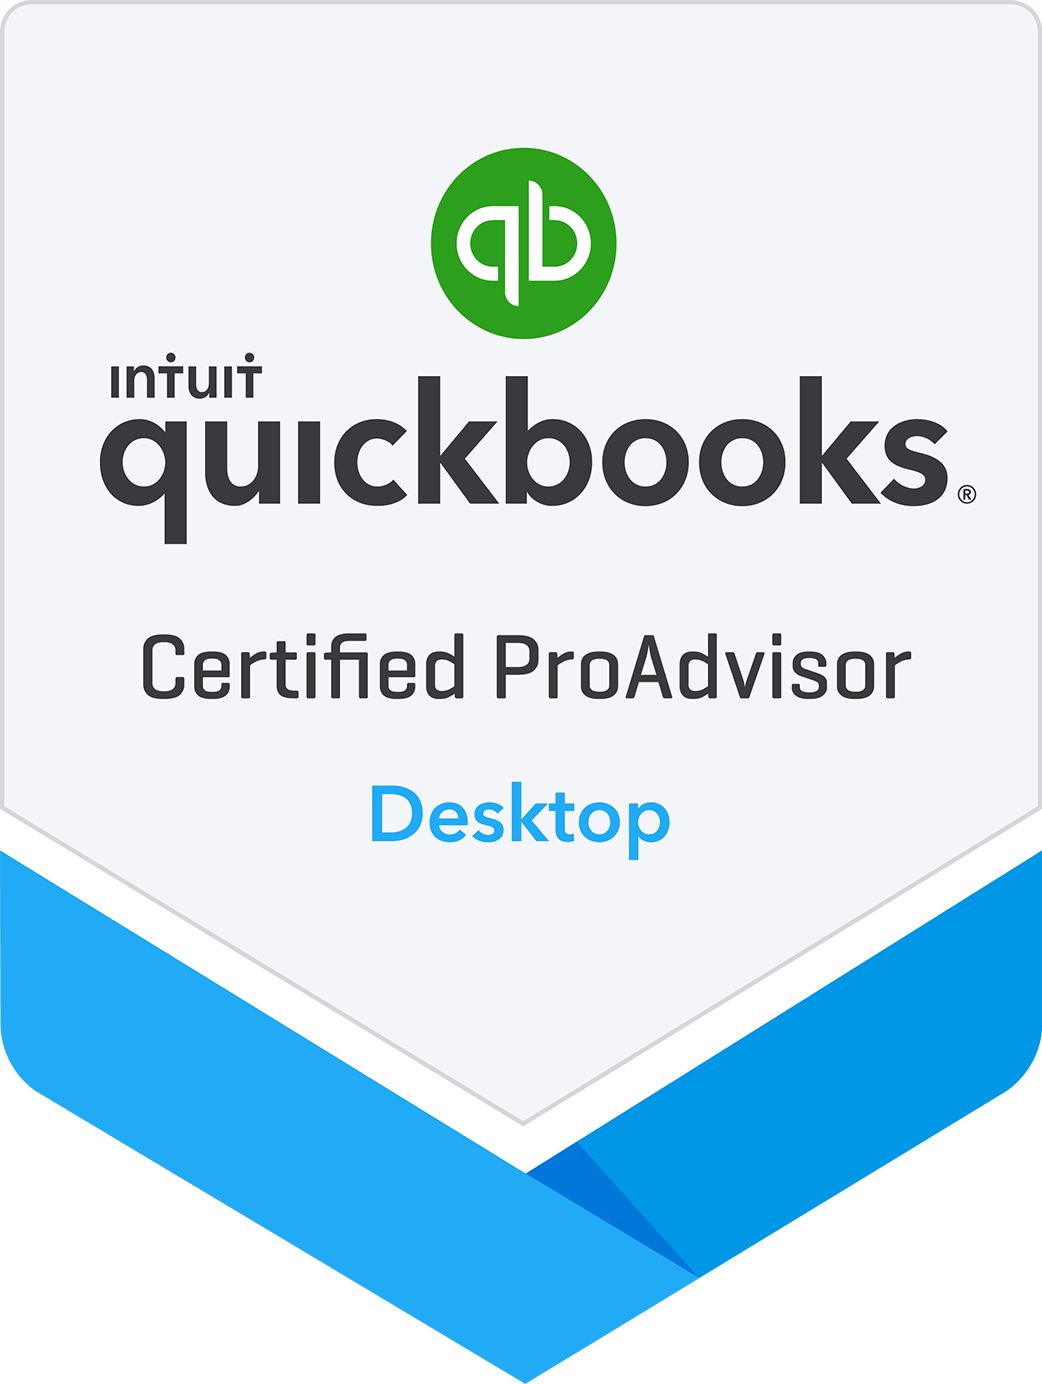 quickbooks Certified ProAdvisor - Desktop